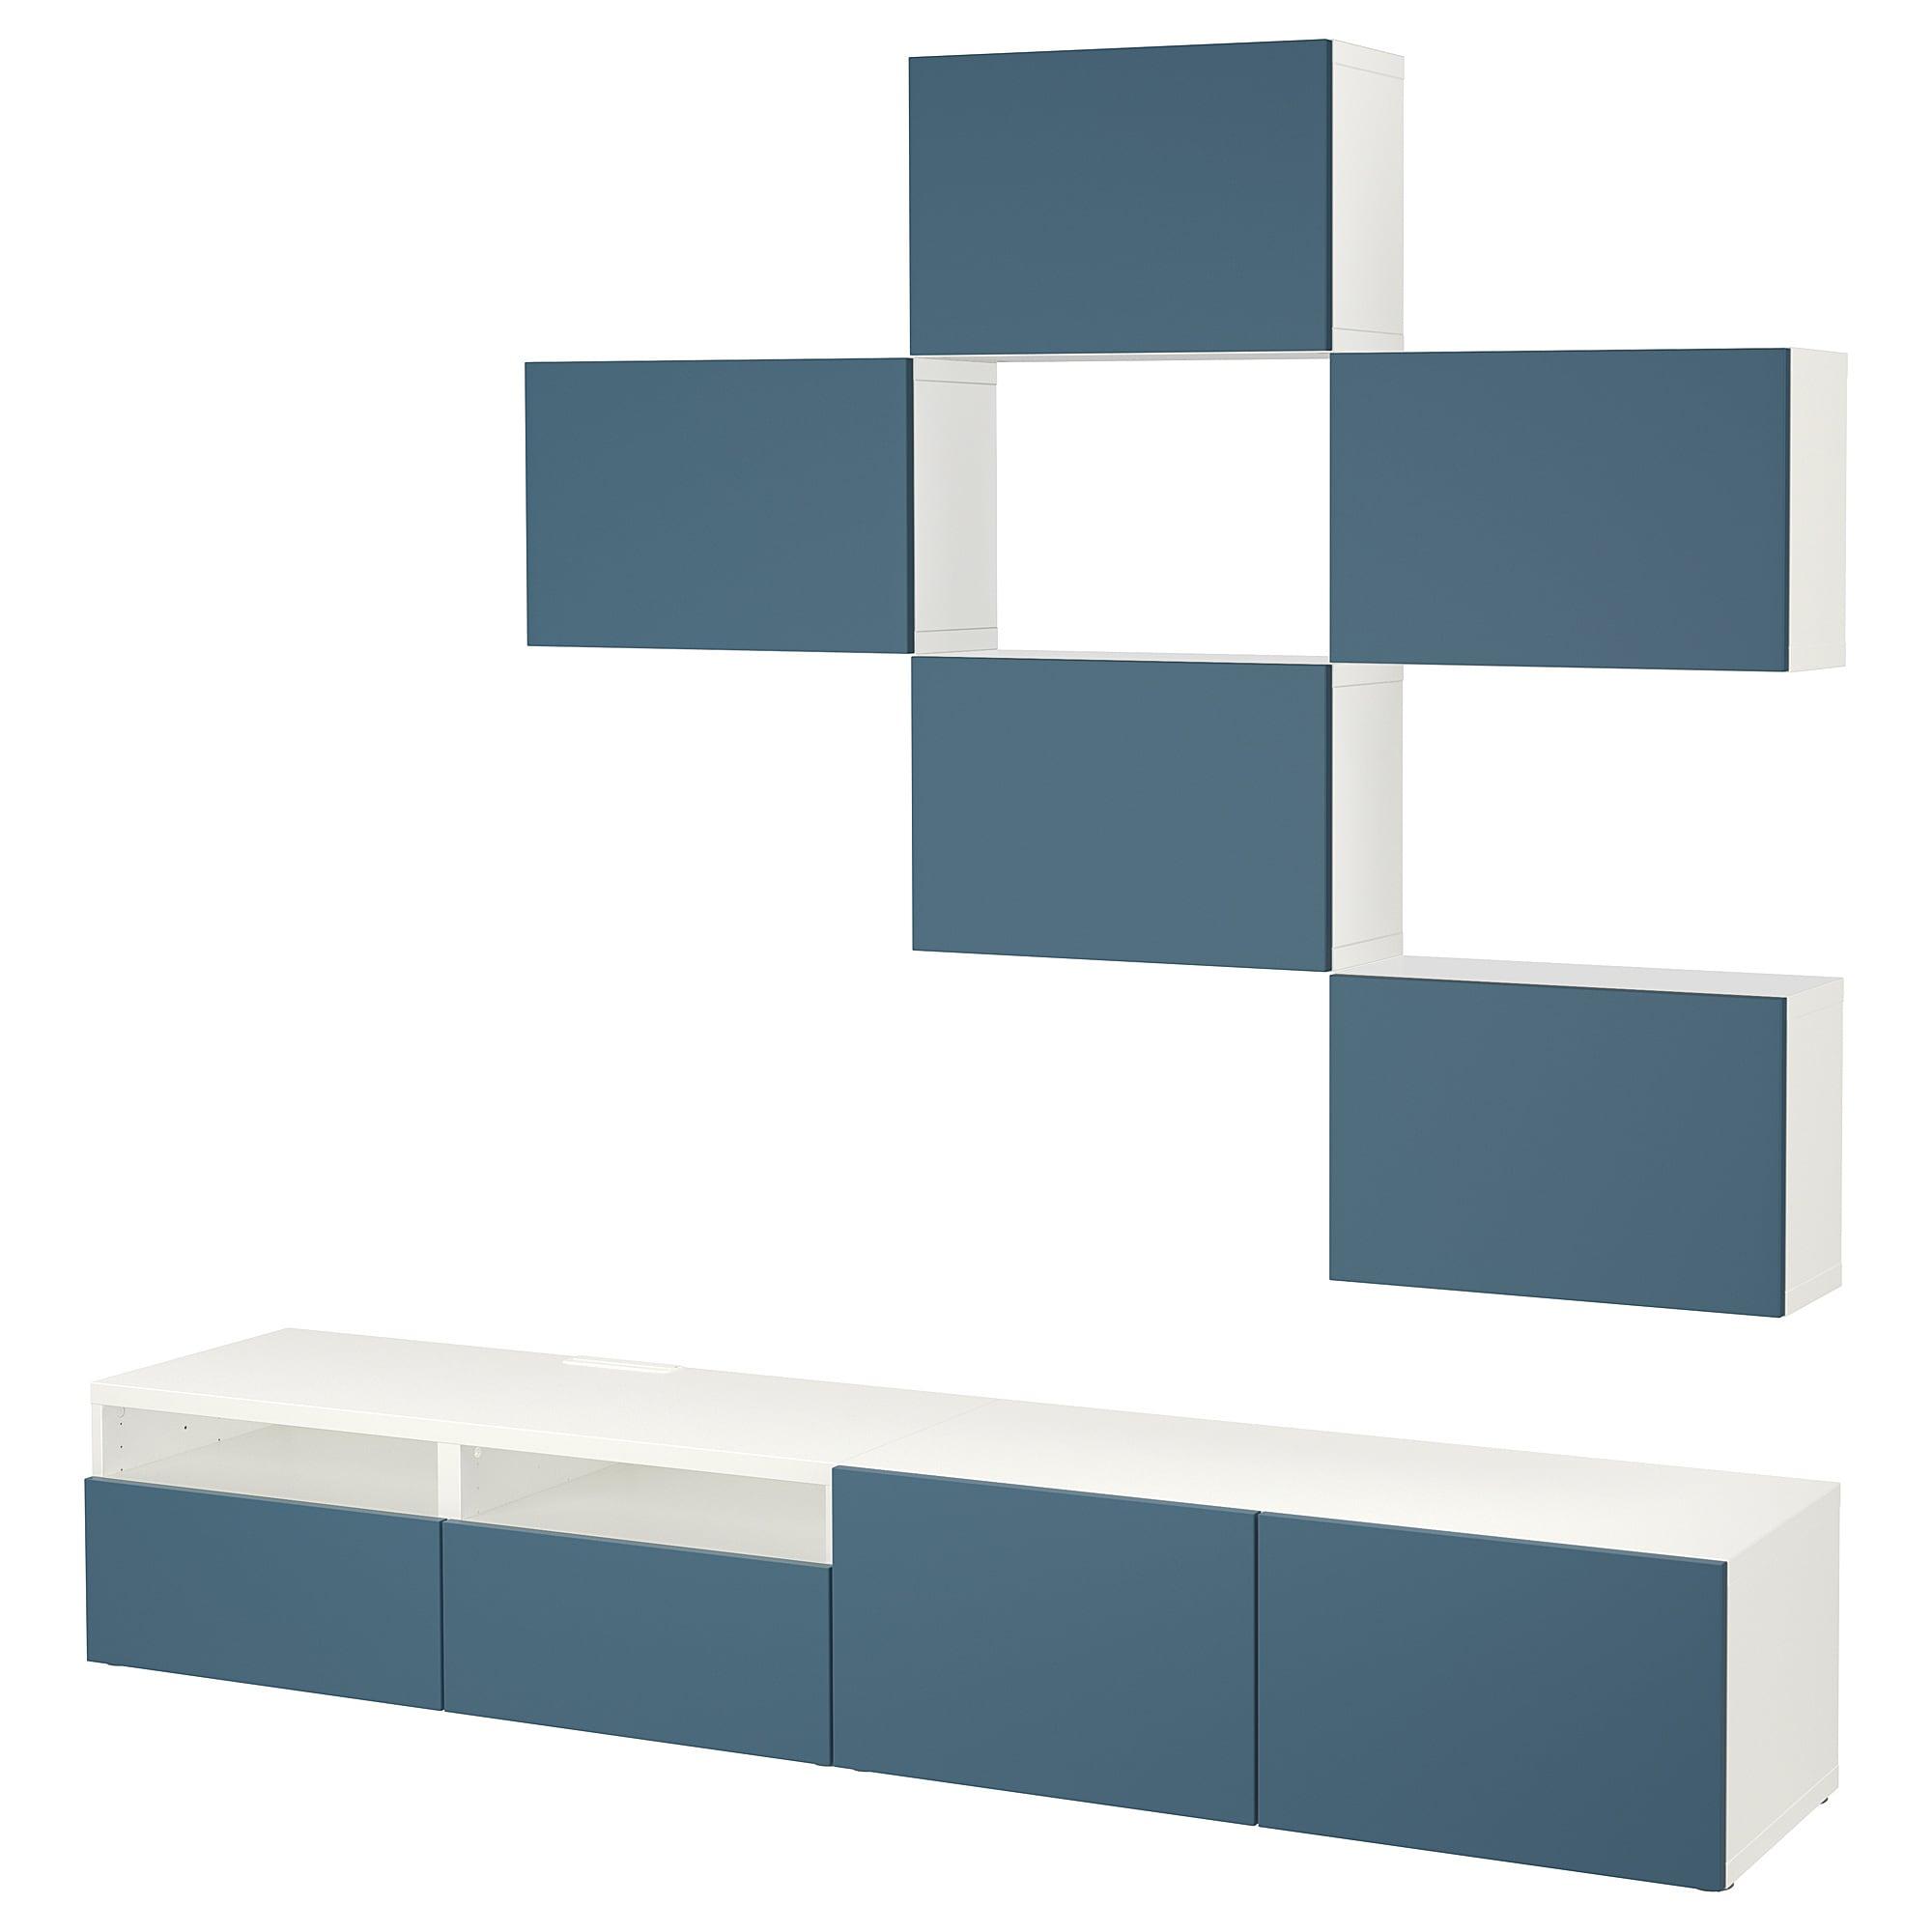 Шкаф для ТВ, комбинация БЕСТО темно-синий артикуль № 492.516.81 в наличии. Online сайт IKEA РБ. Недорогая доставка и установка.